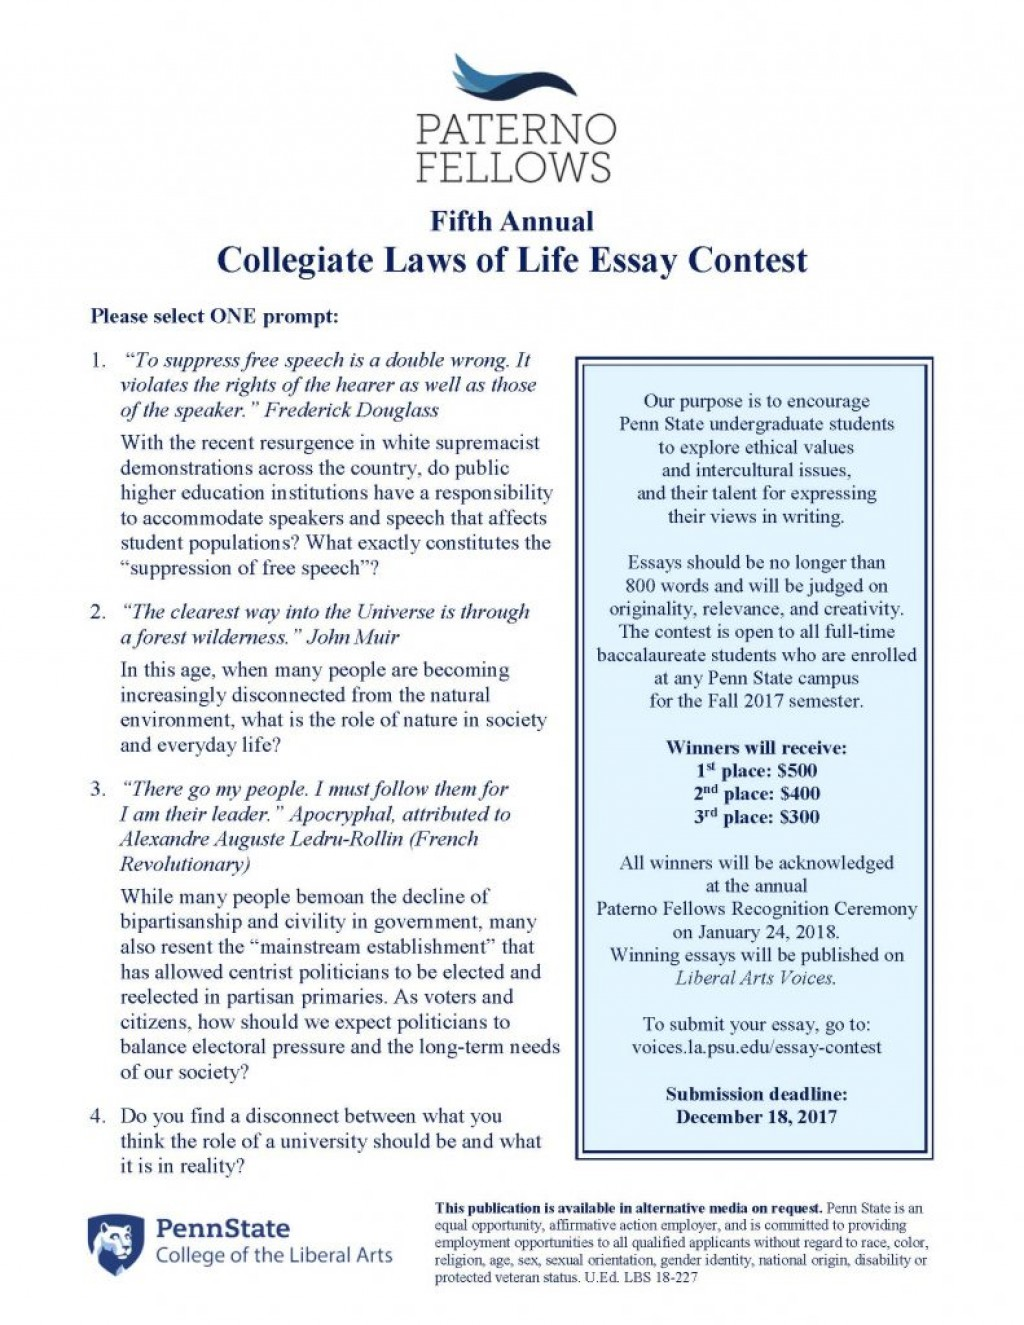 012 Age Of Responsibility Essay Example Clol Flyer 2i93tbr Awful Persuasive Argumentative Criminal Large